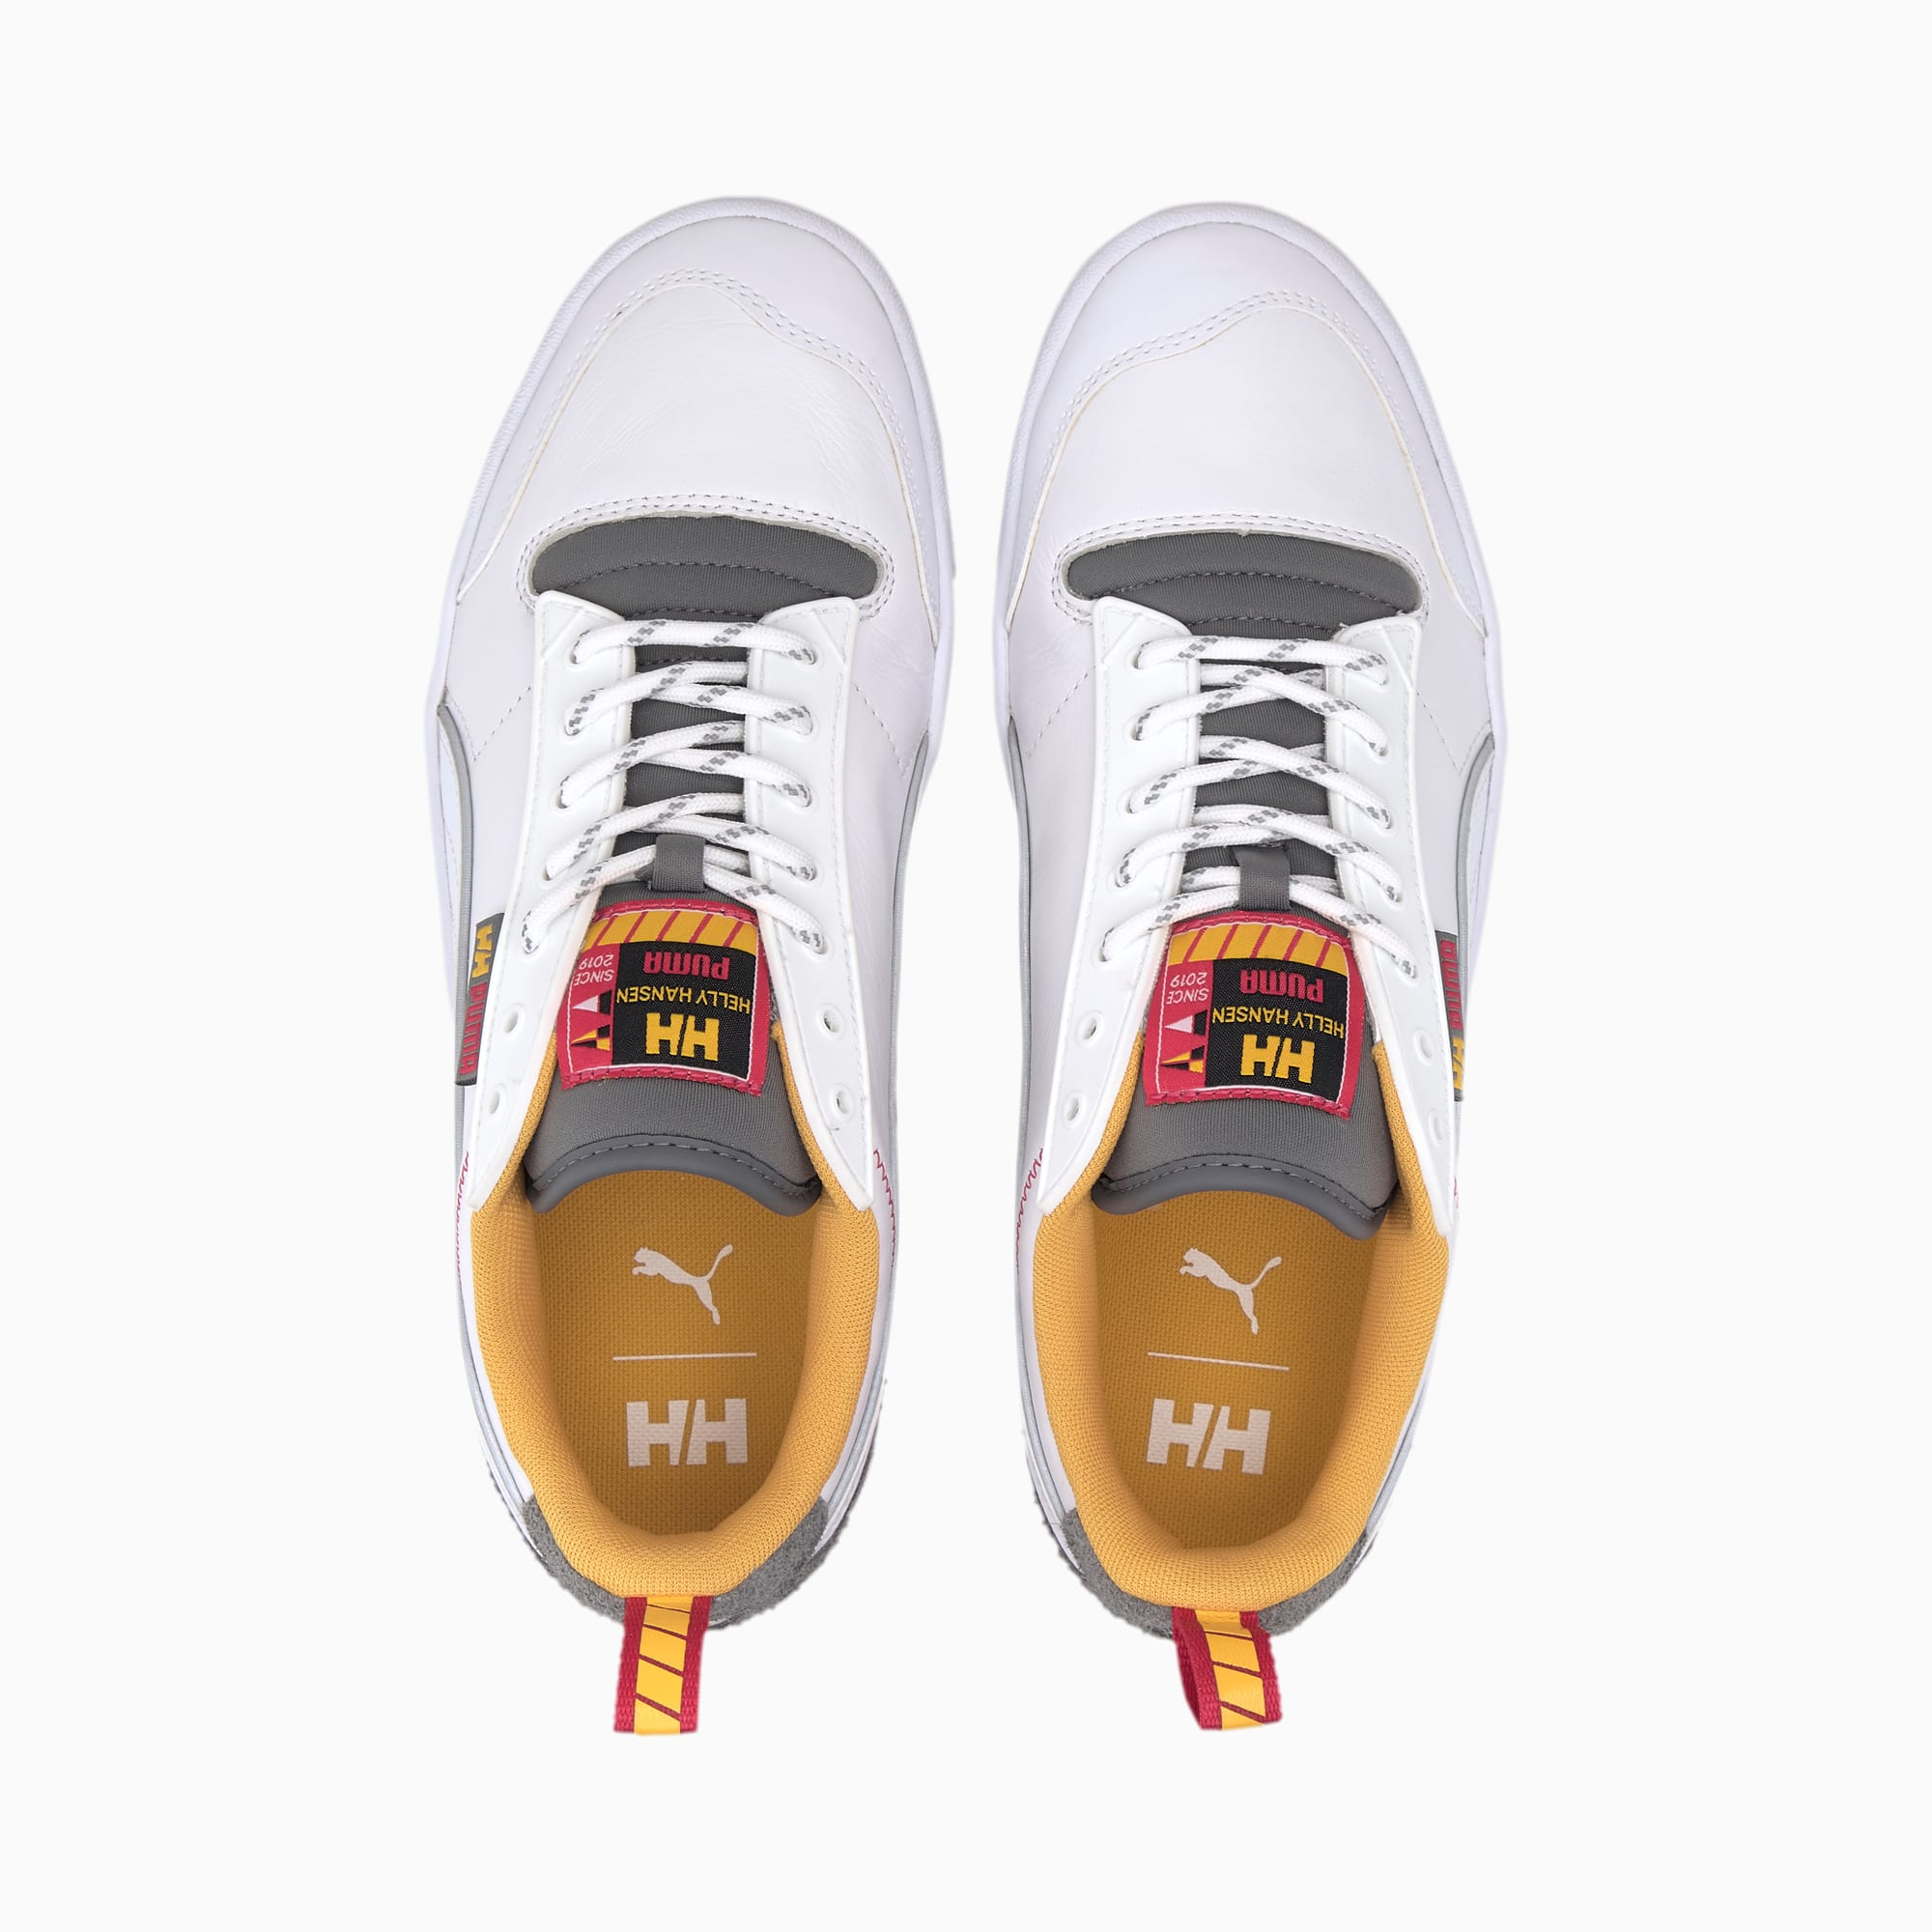 PUMA x HELLY HANSEN Ralph Sampson Sneakers